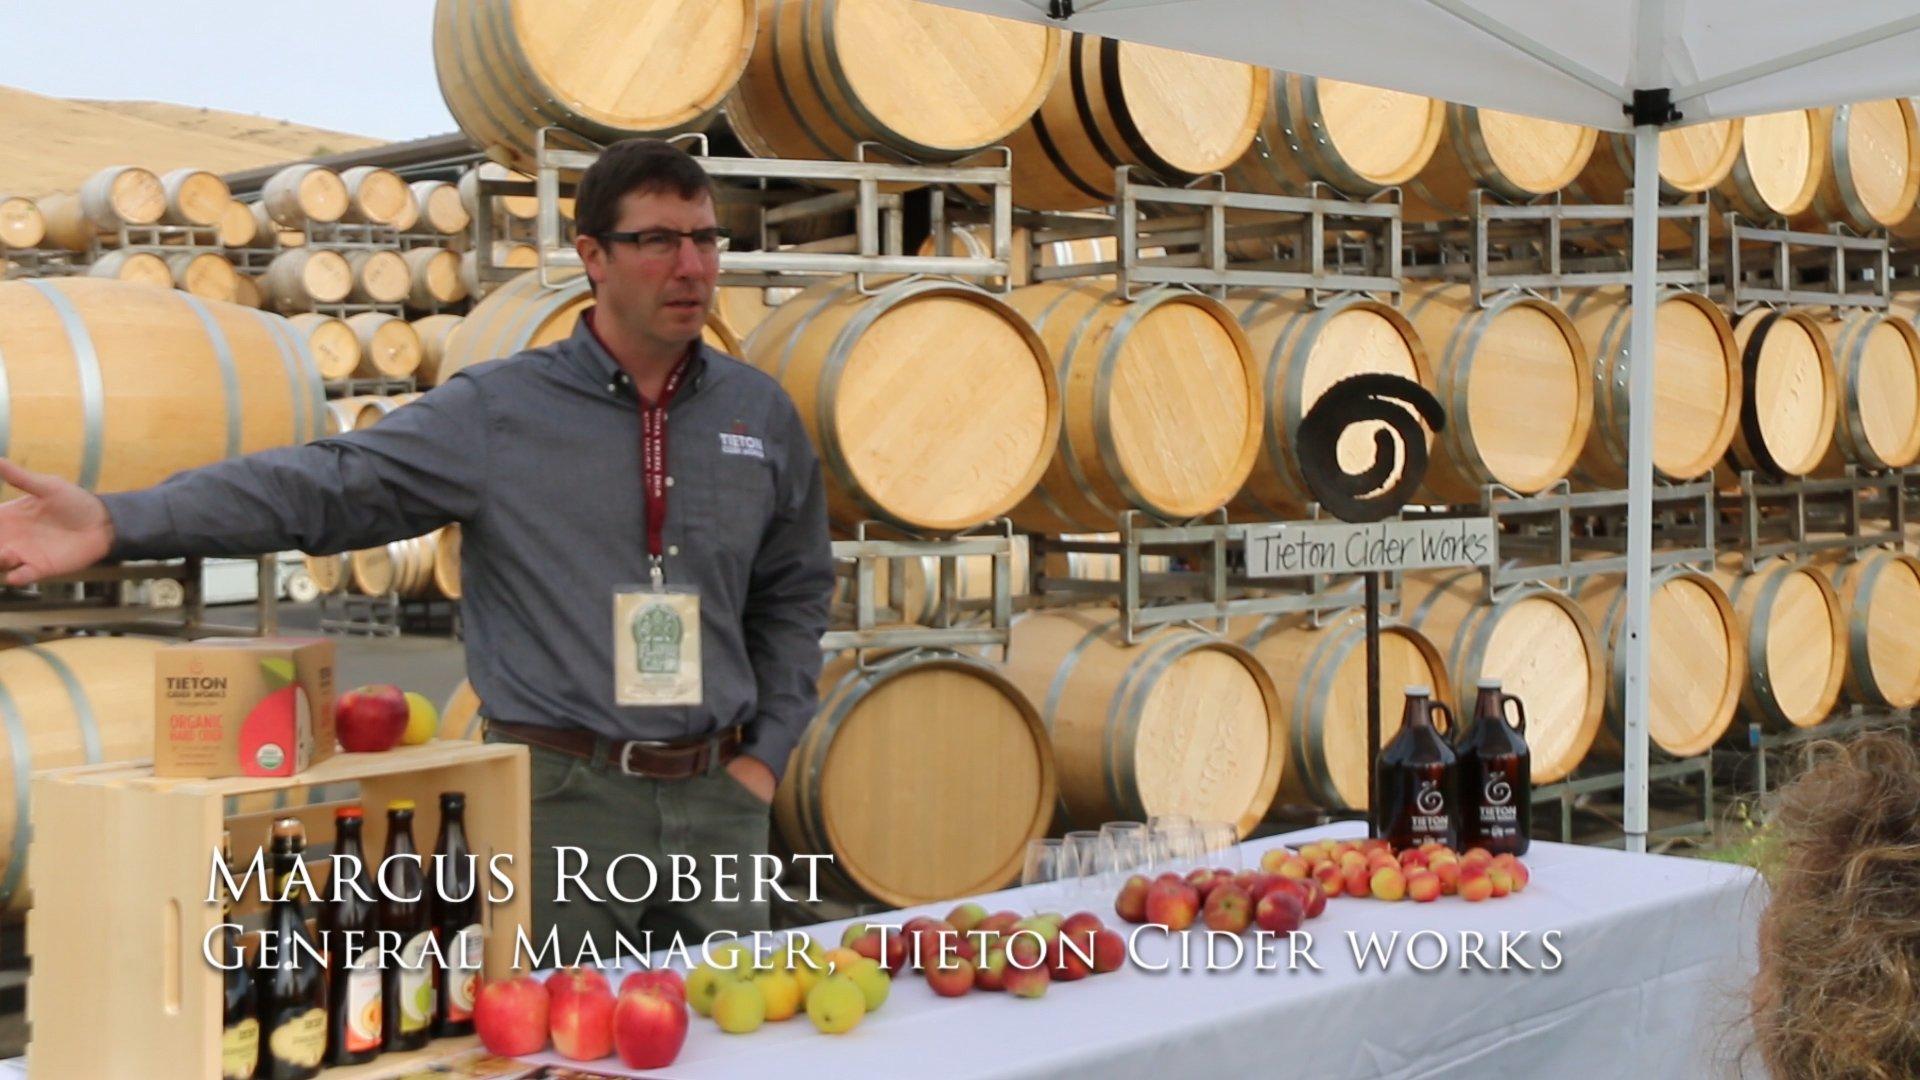 Marcus Roberts, Tieton Cider Works